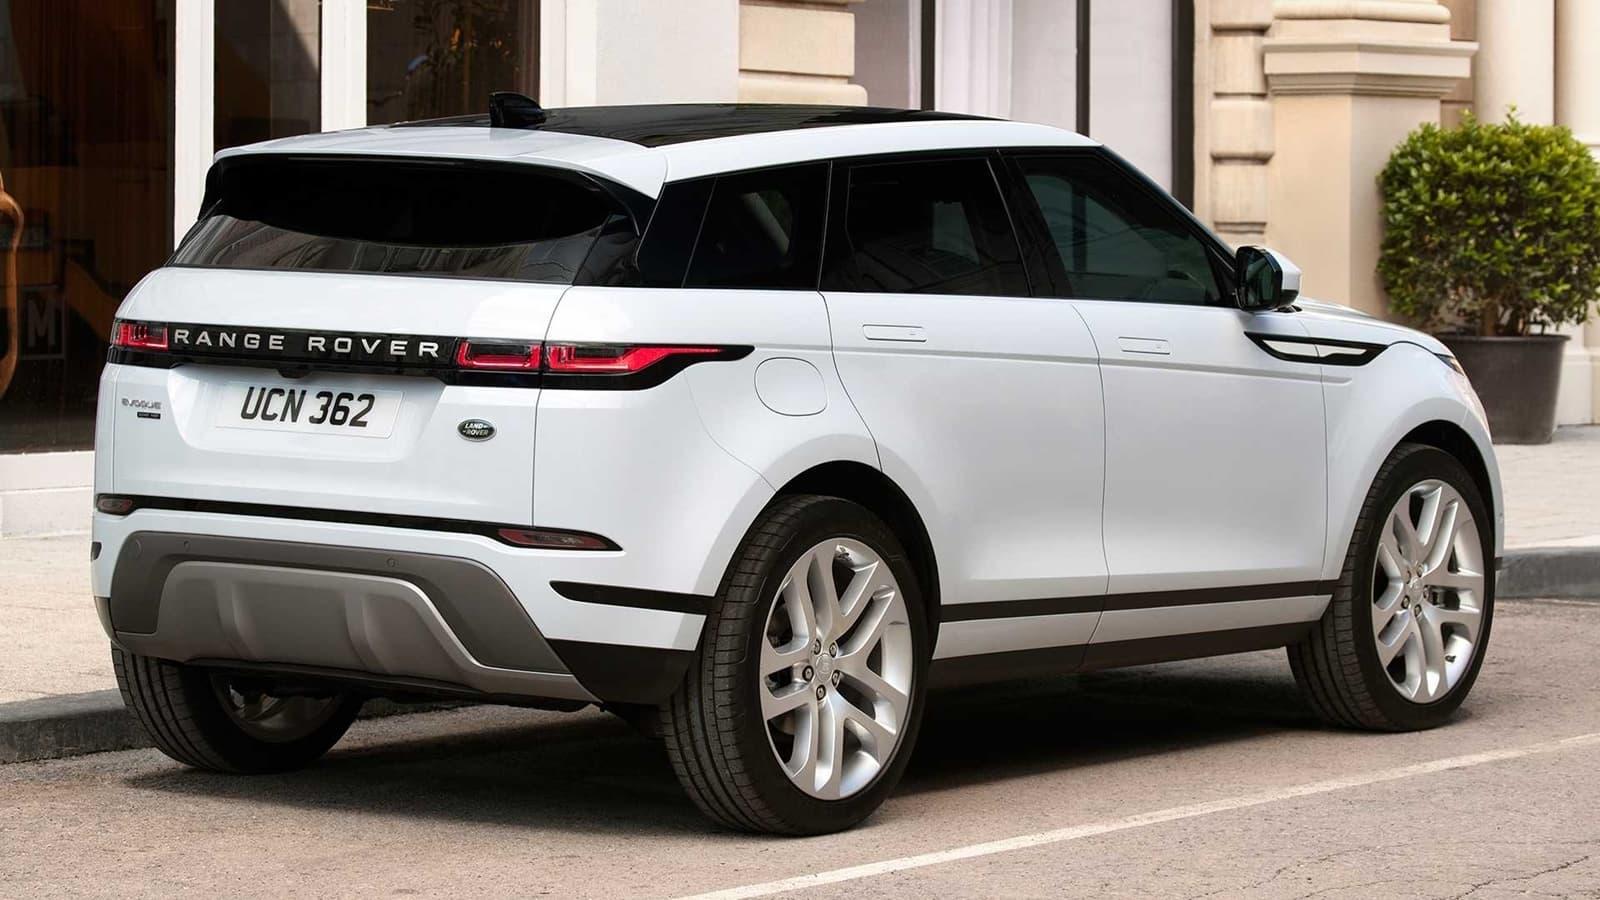 Range Rover Evoque 2019 1118 054